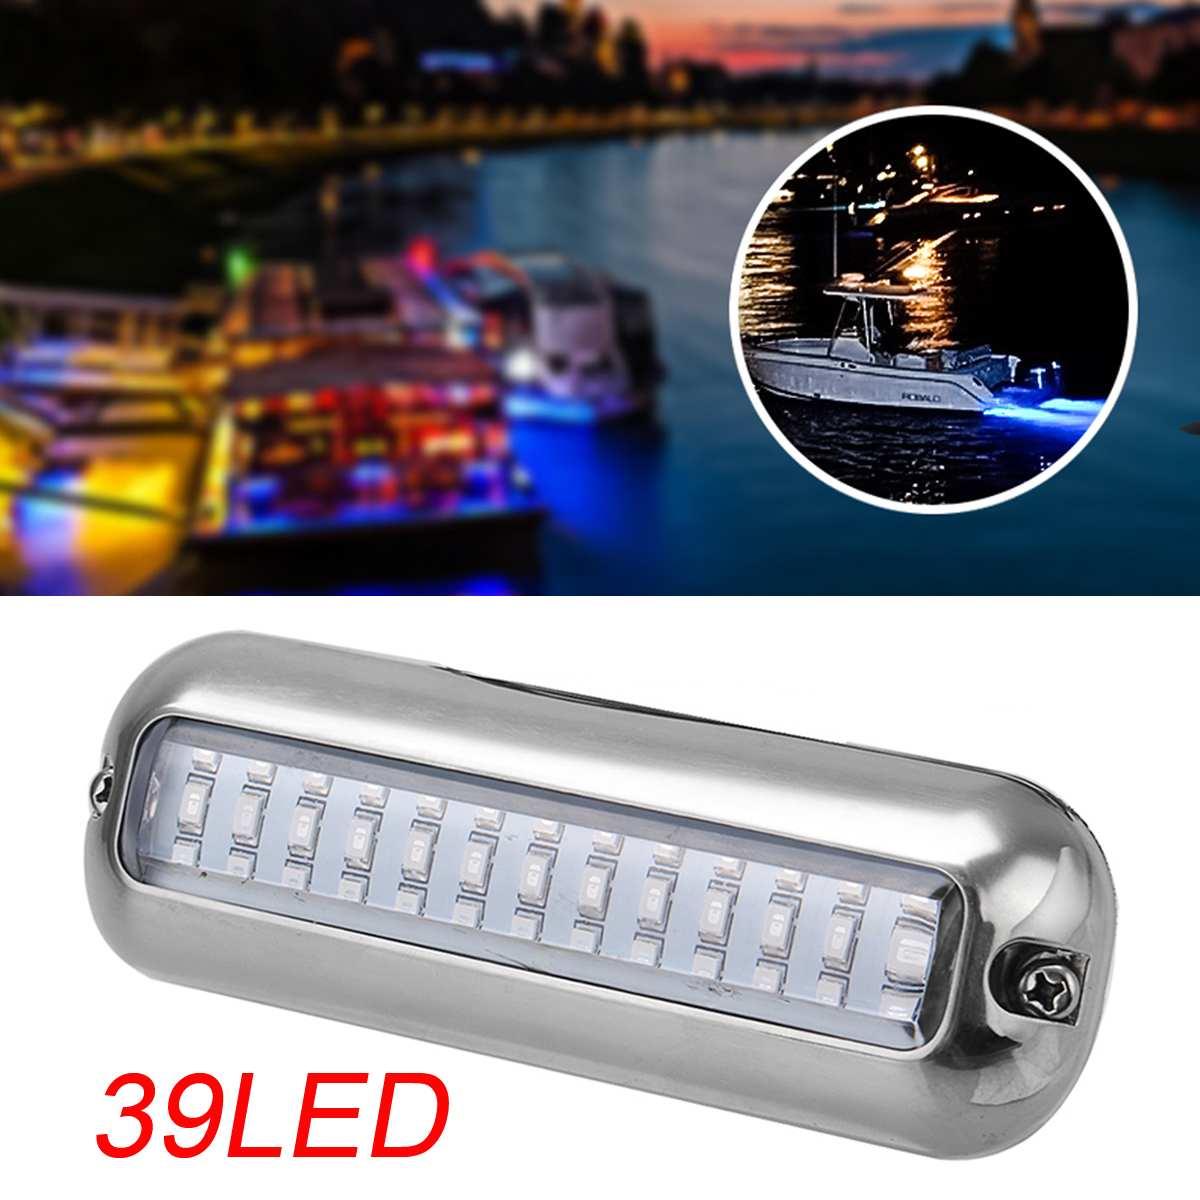 10-30VDC 5.2W 39LED Blue Waterproof High Intensity LED Underwater Lights Boat Transom Light LED Navigation Light Yacht